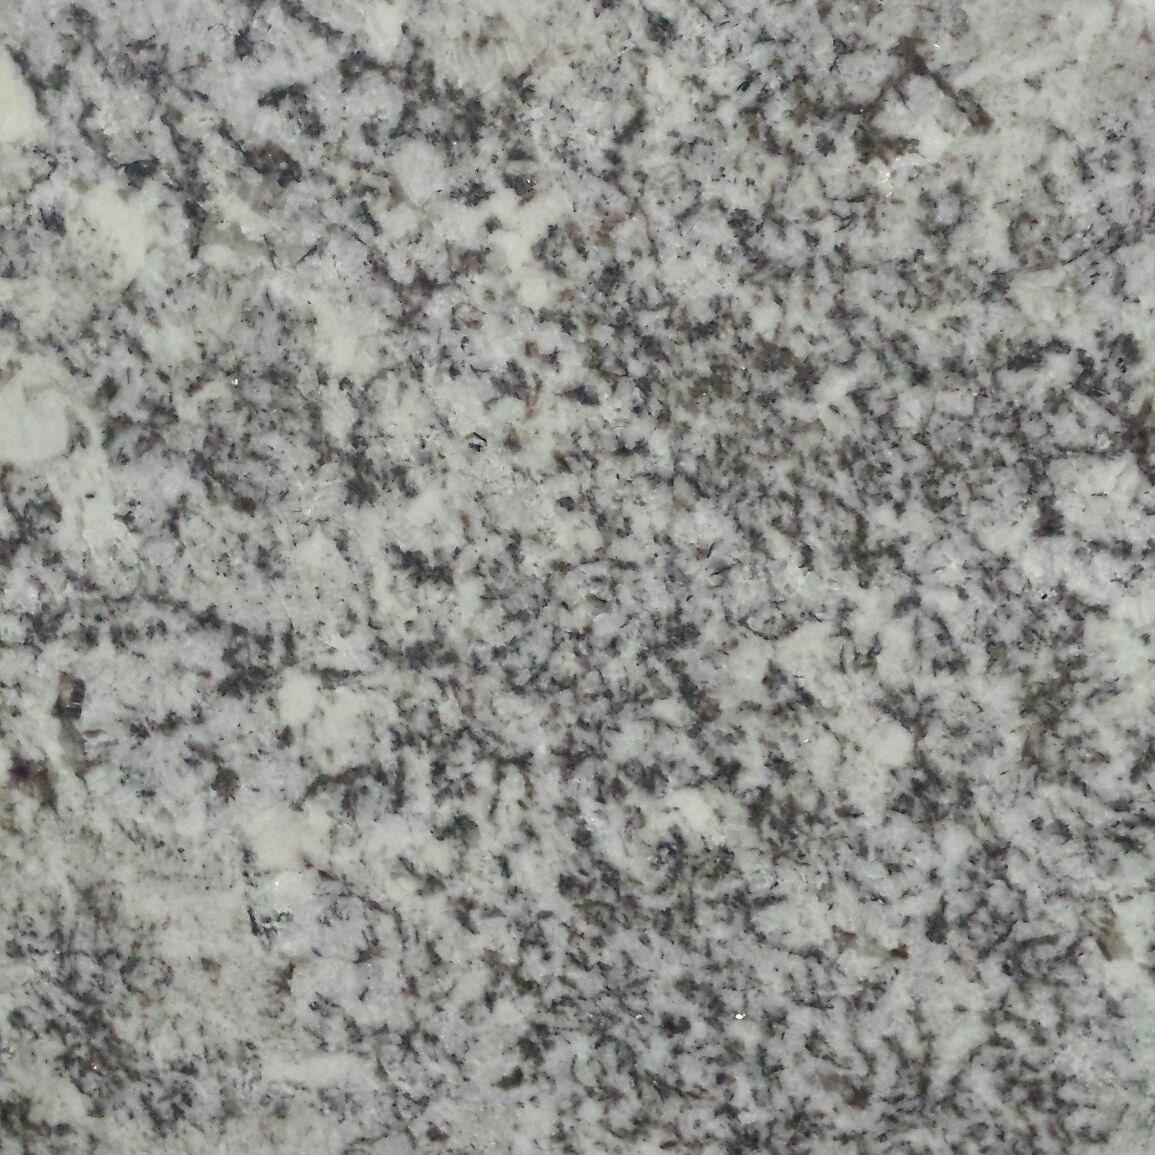 Sweet C Spring Granite Counterops Showroom Ne C Spring Granite Counters C Spring Granite C Spring Minnesota houzz-02 Cold Spring Granite